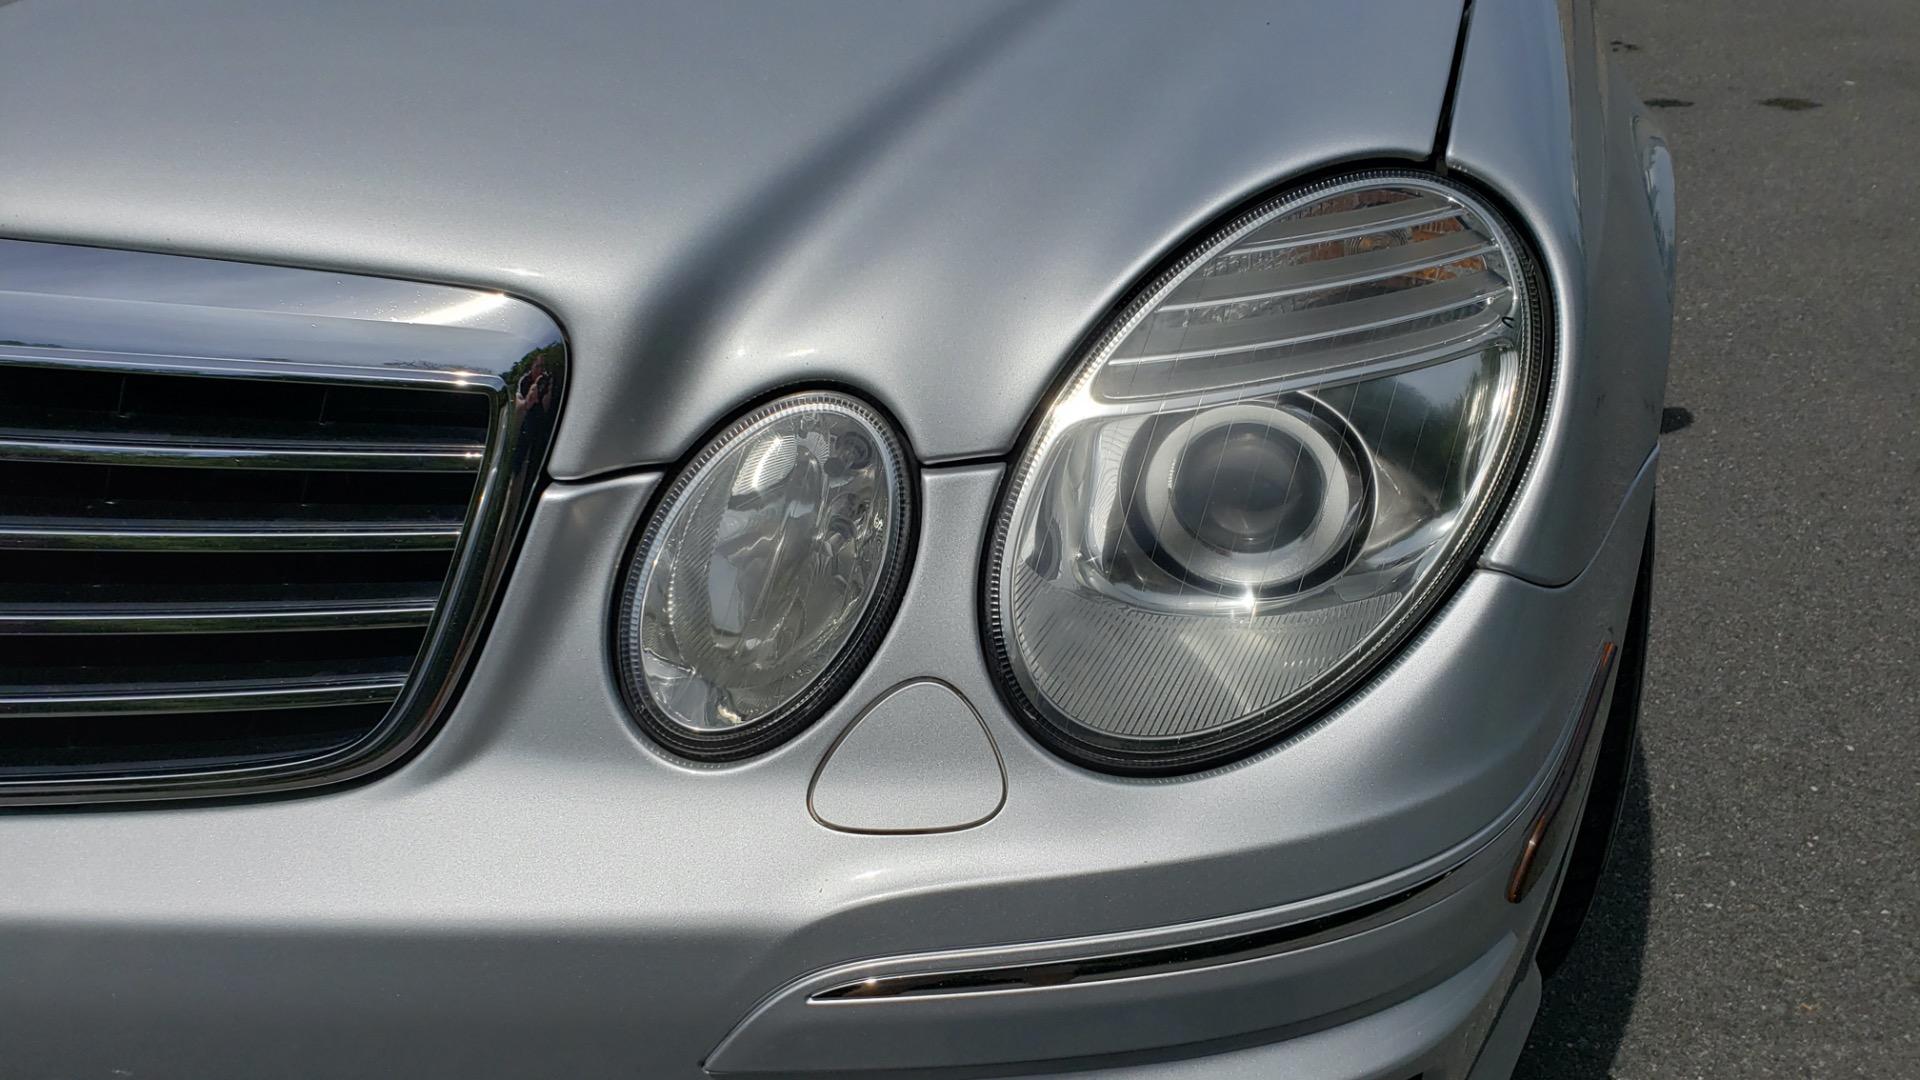 Used 2007 Mercedes-Benz E-Class E63 AMG WAGON / NAV / SUNROOF / HARMAN/KARDON for sale $29,000 at Formula Imports in Charlotte NC 28227 33